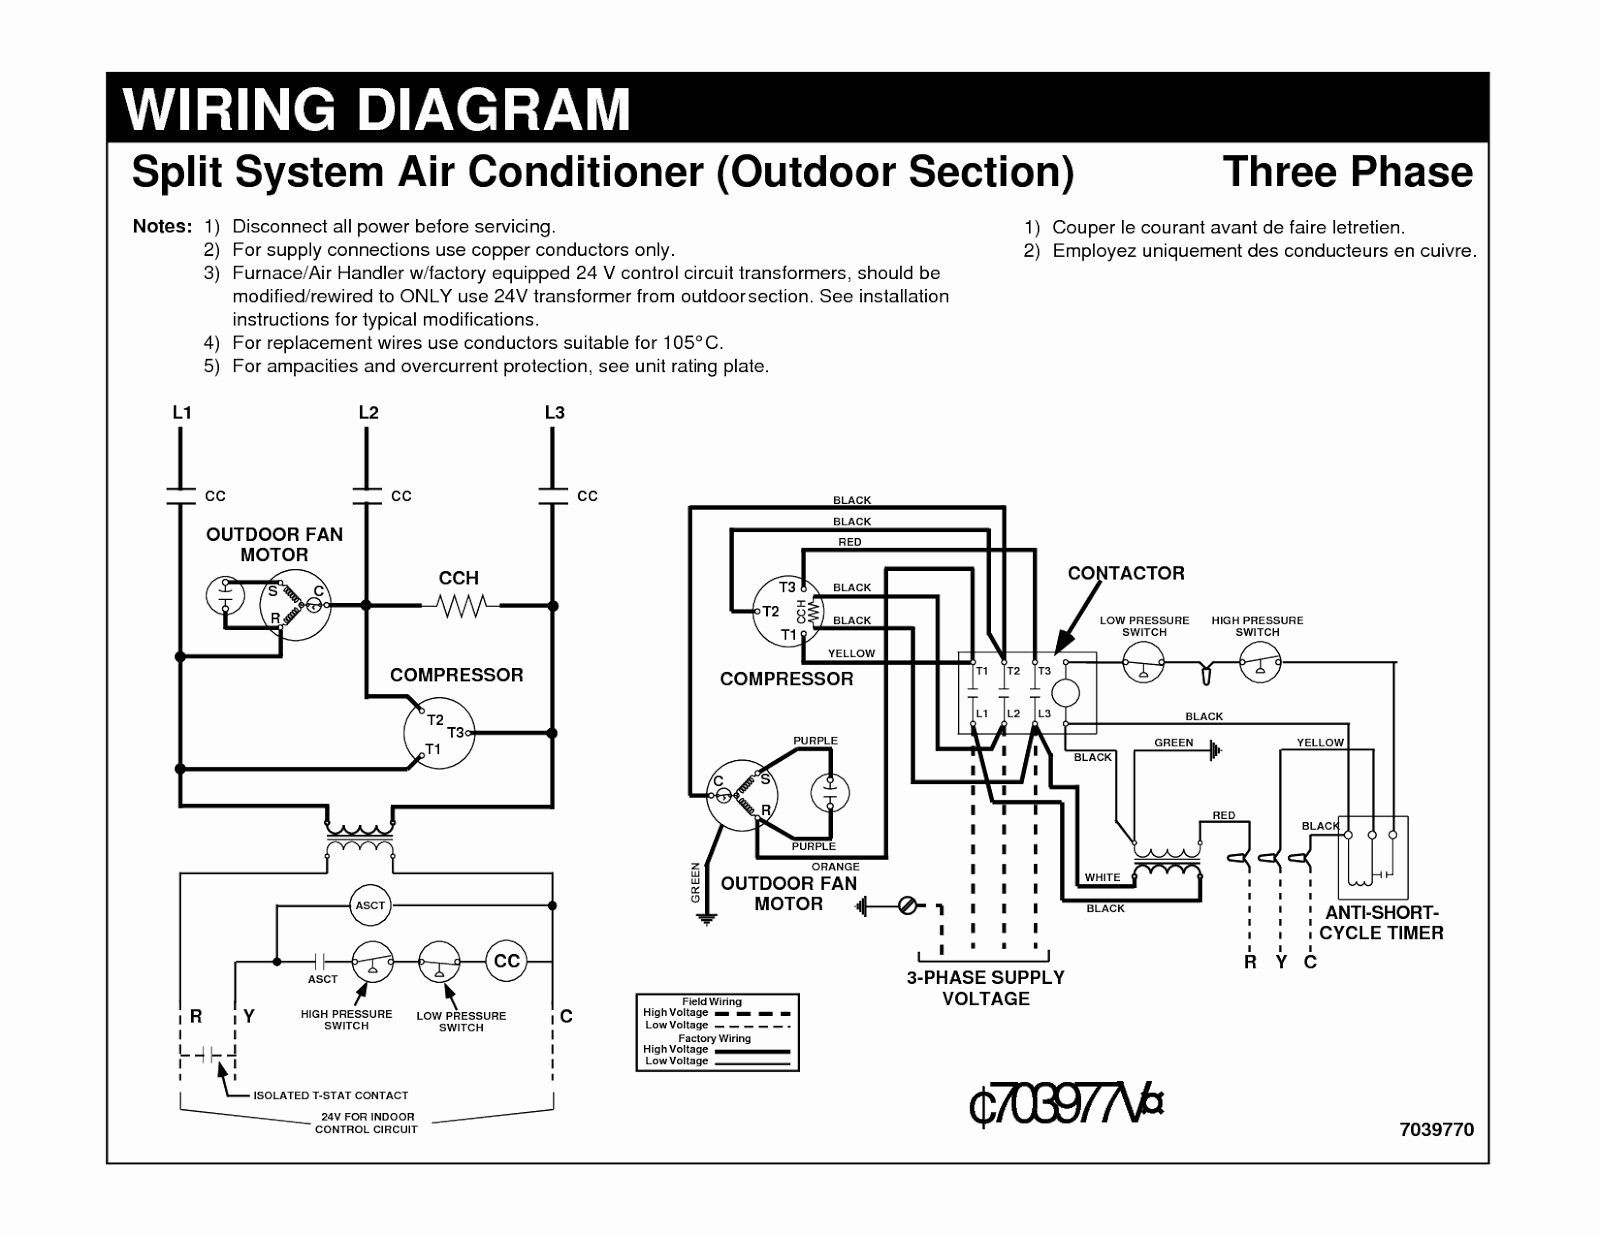 New Fire Alarm System Wiring Diagram